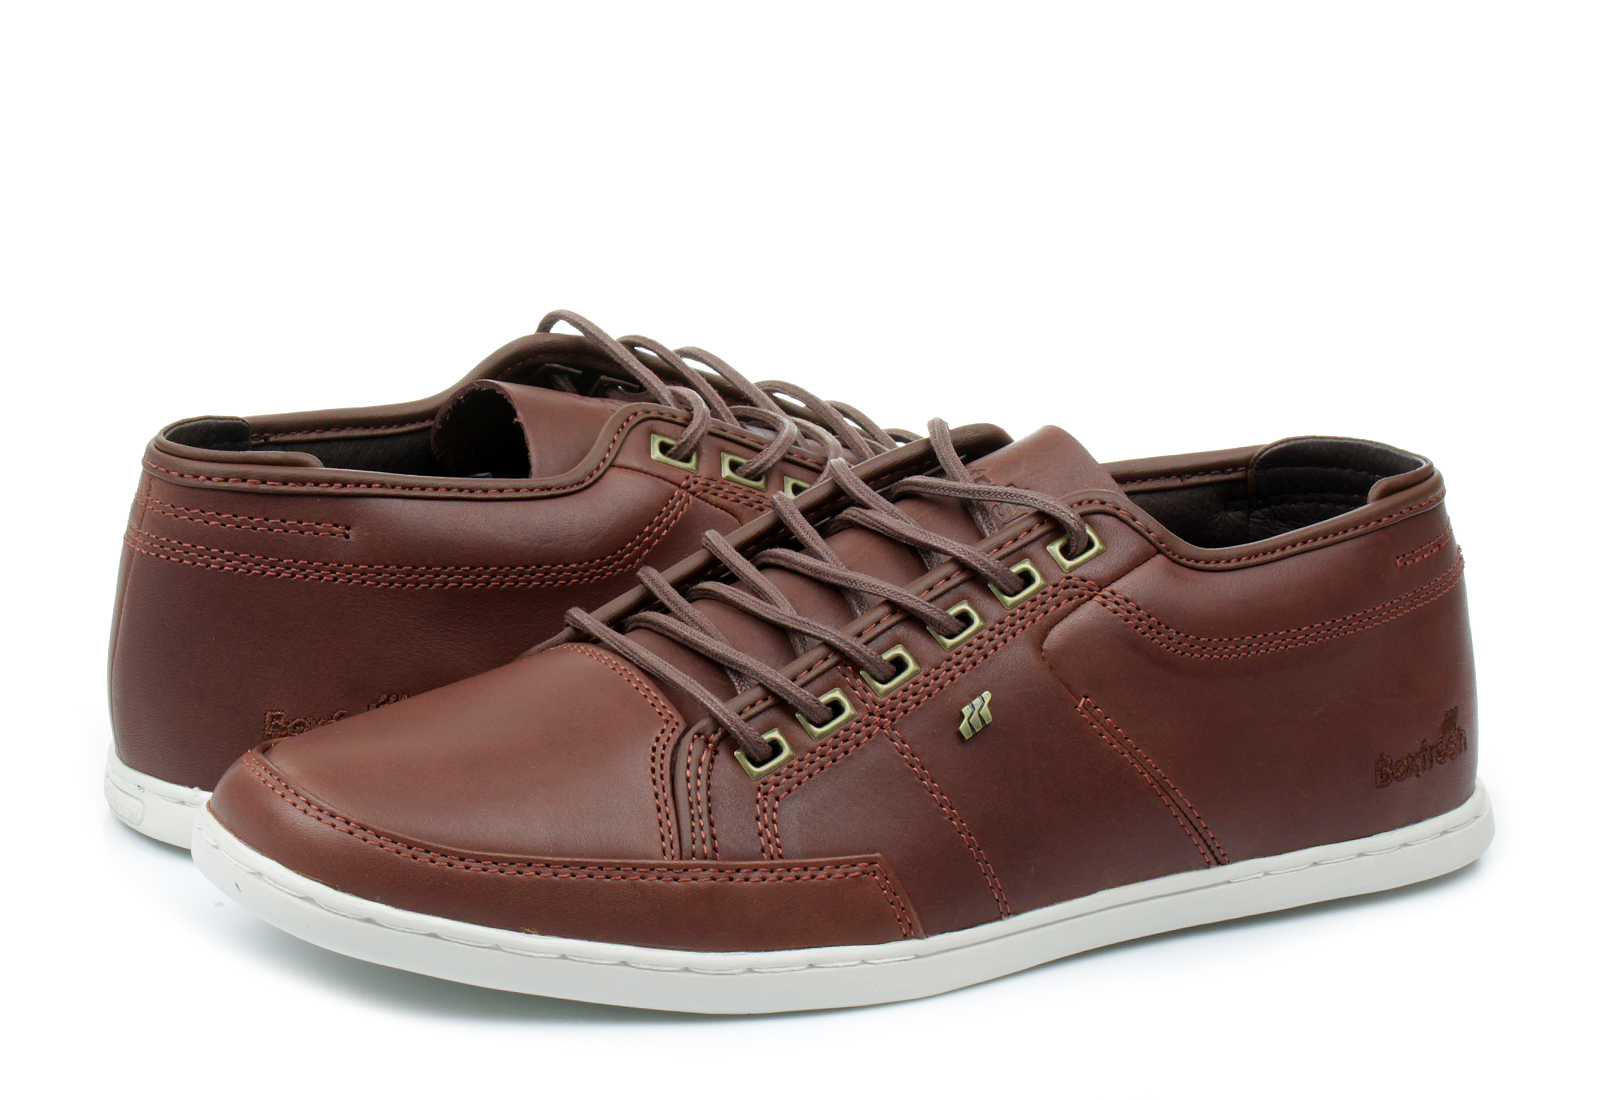 wholesale dealer 75f80 68def Boxfresh Shoes - Sparko Prem - E15196-rst - Online shop for sneakers, shoes  and boots